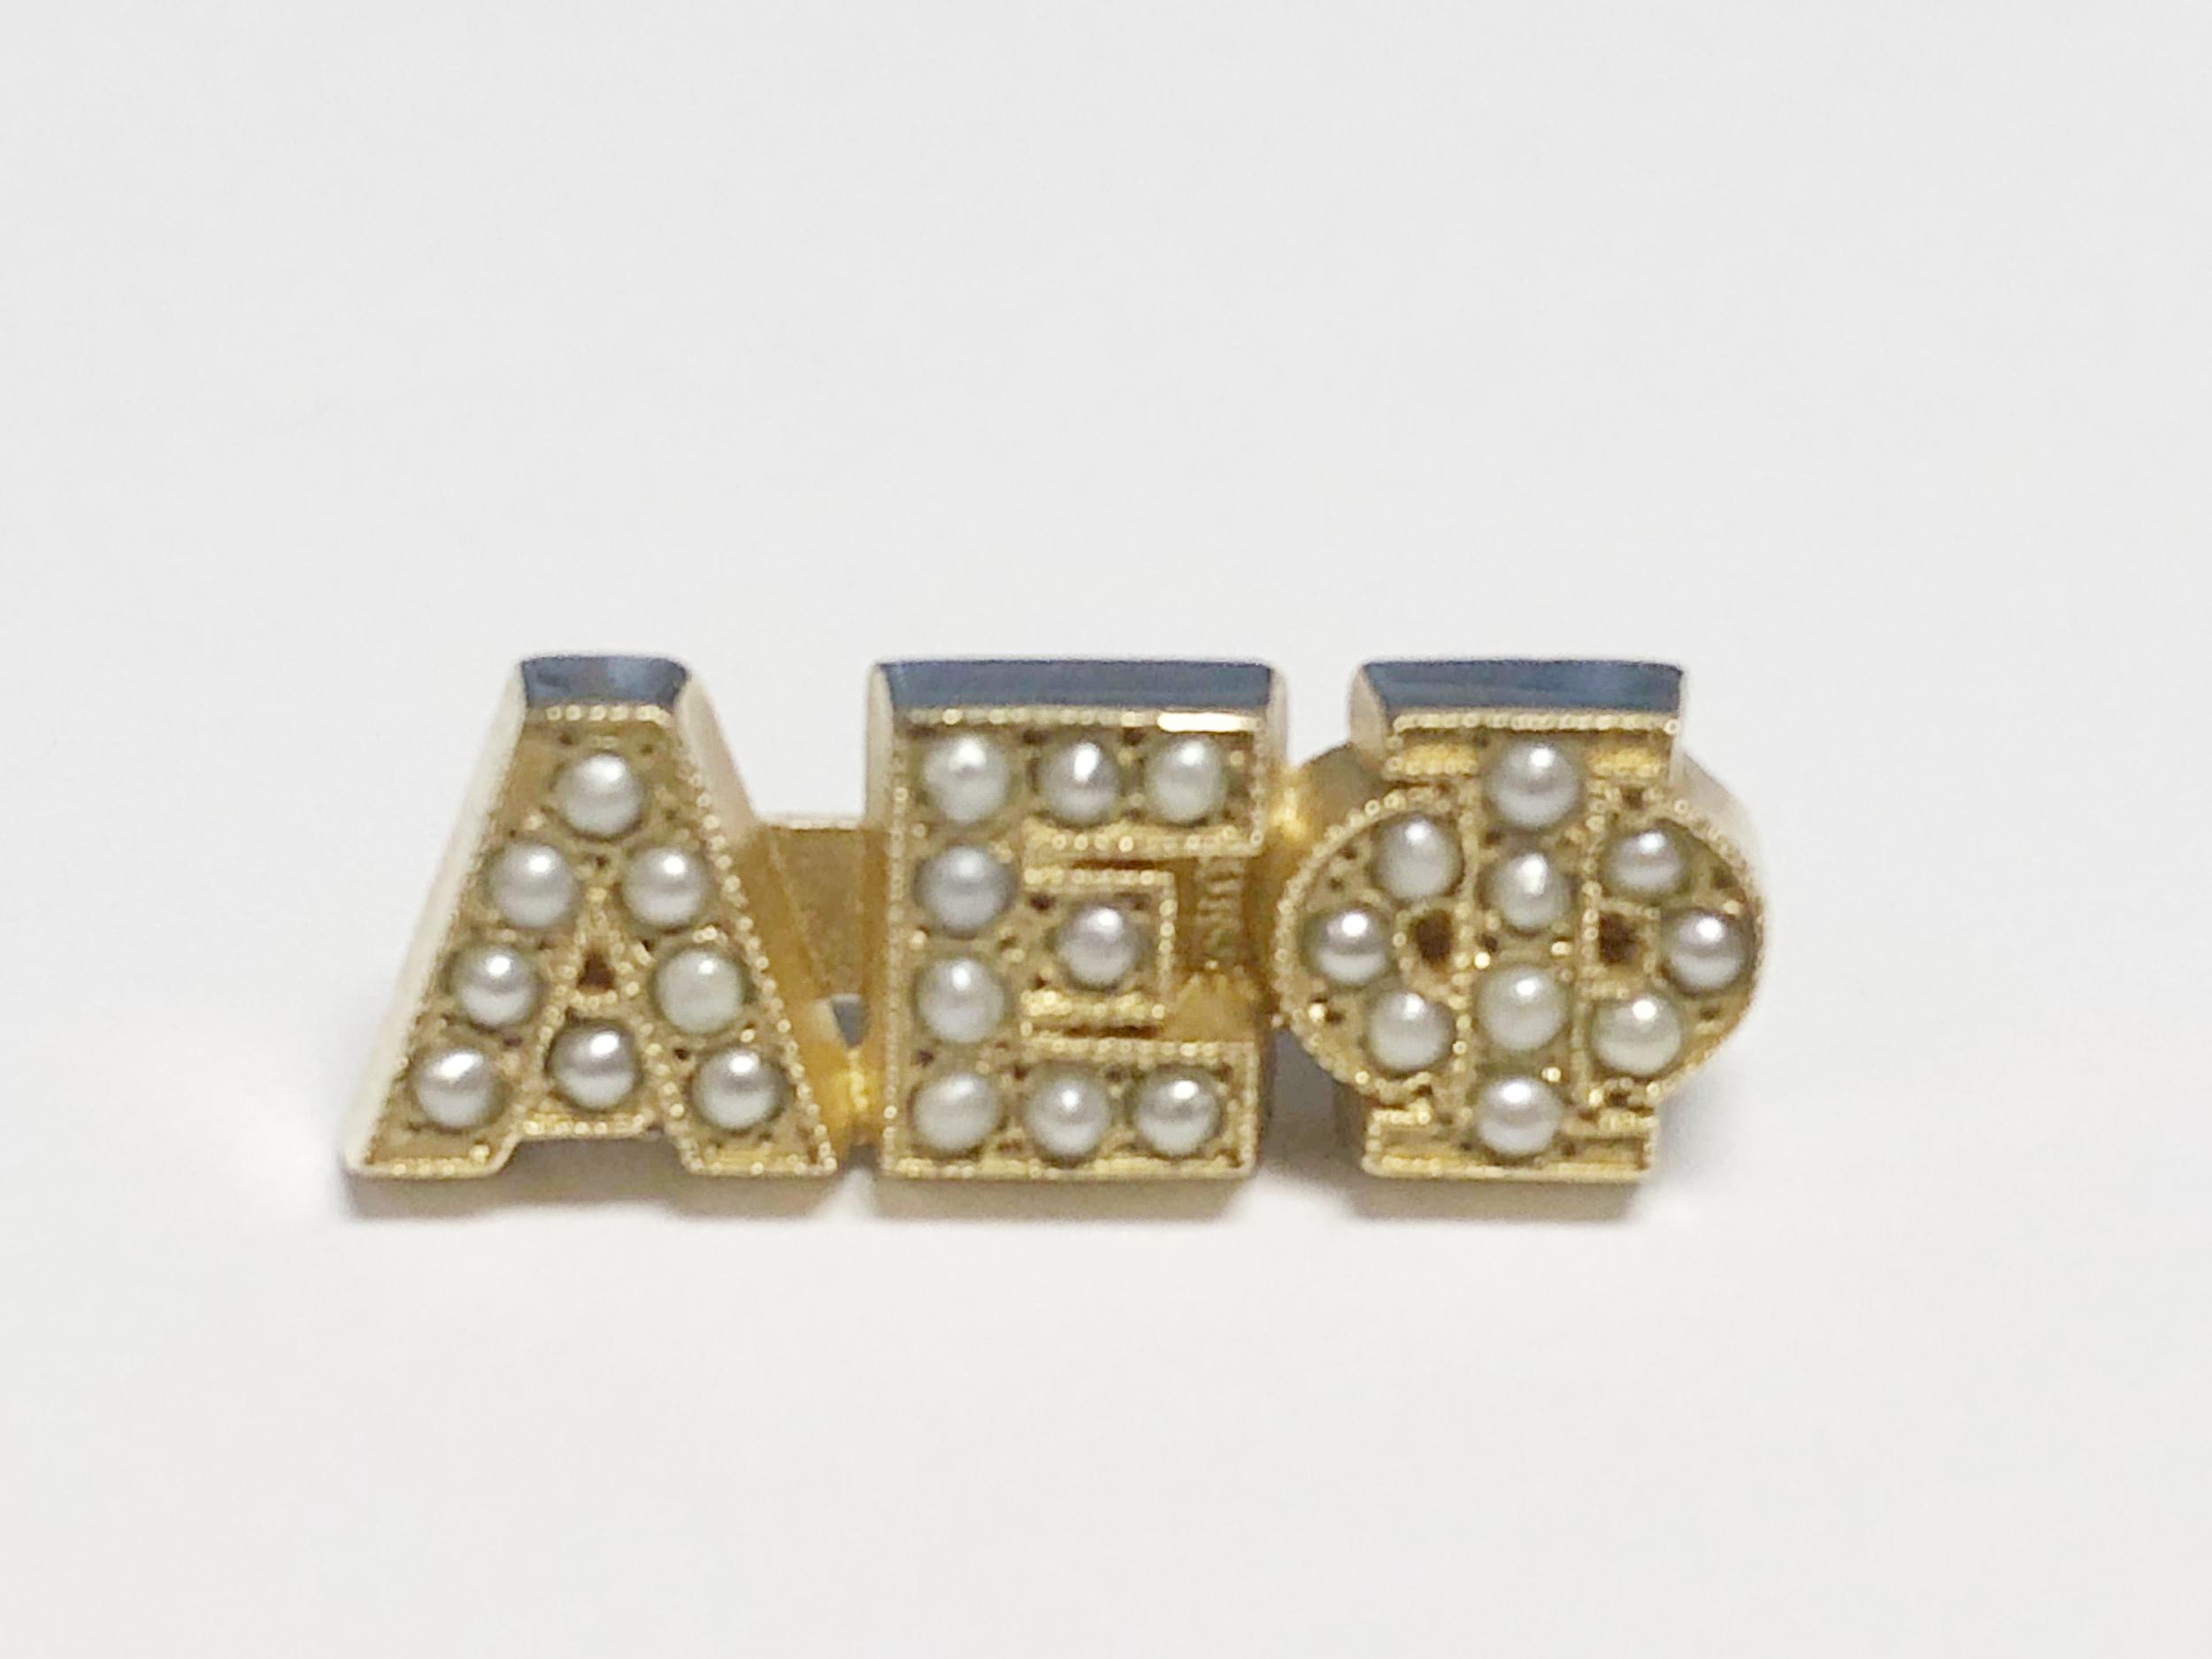 BADGE - Α, Ε & Φ upon a thin gold bar with a total of 27 pearls.  Α has 8 pearls Ε has 9 pearls Φ has 10 pearls